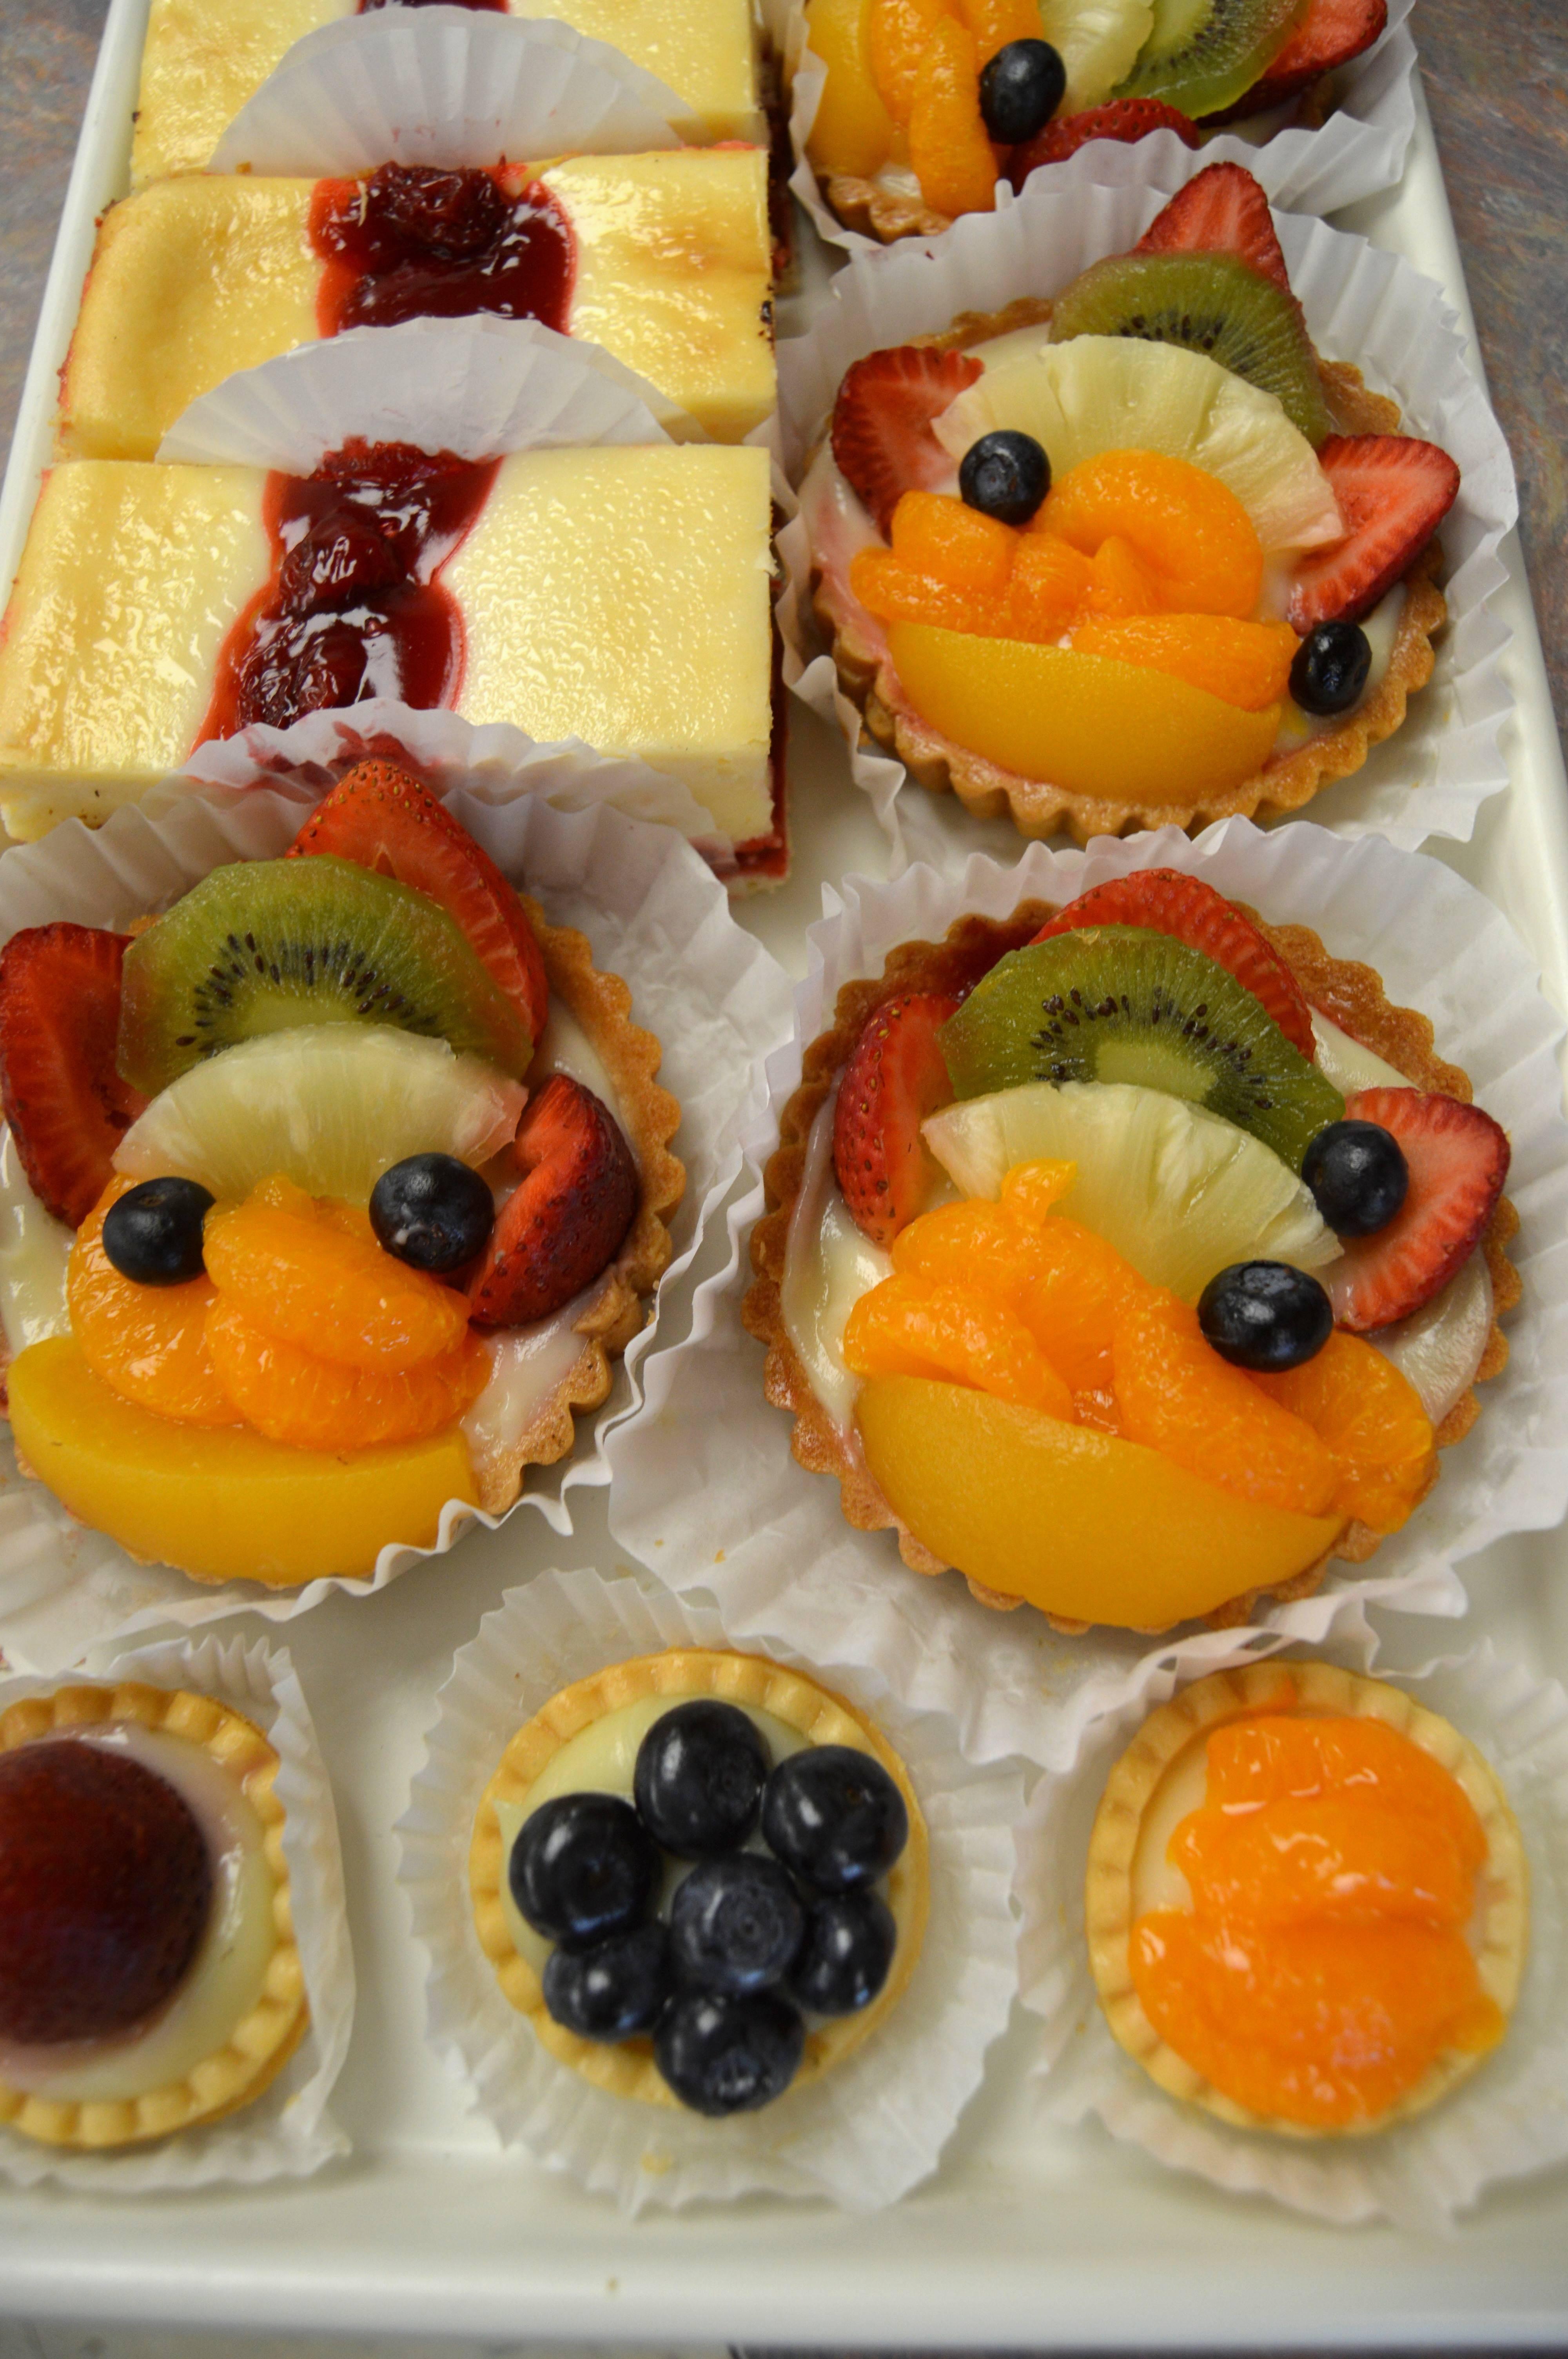 b8380b82a5ec7709703c_Fruit_tarts.JPG